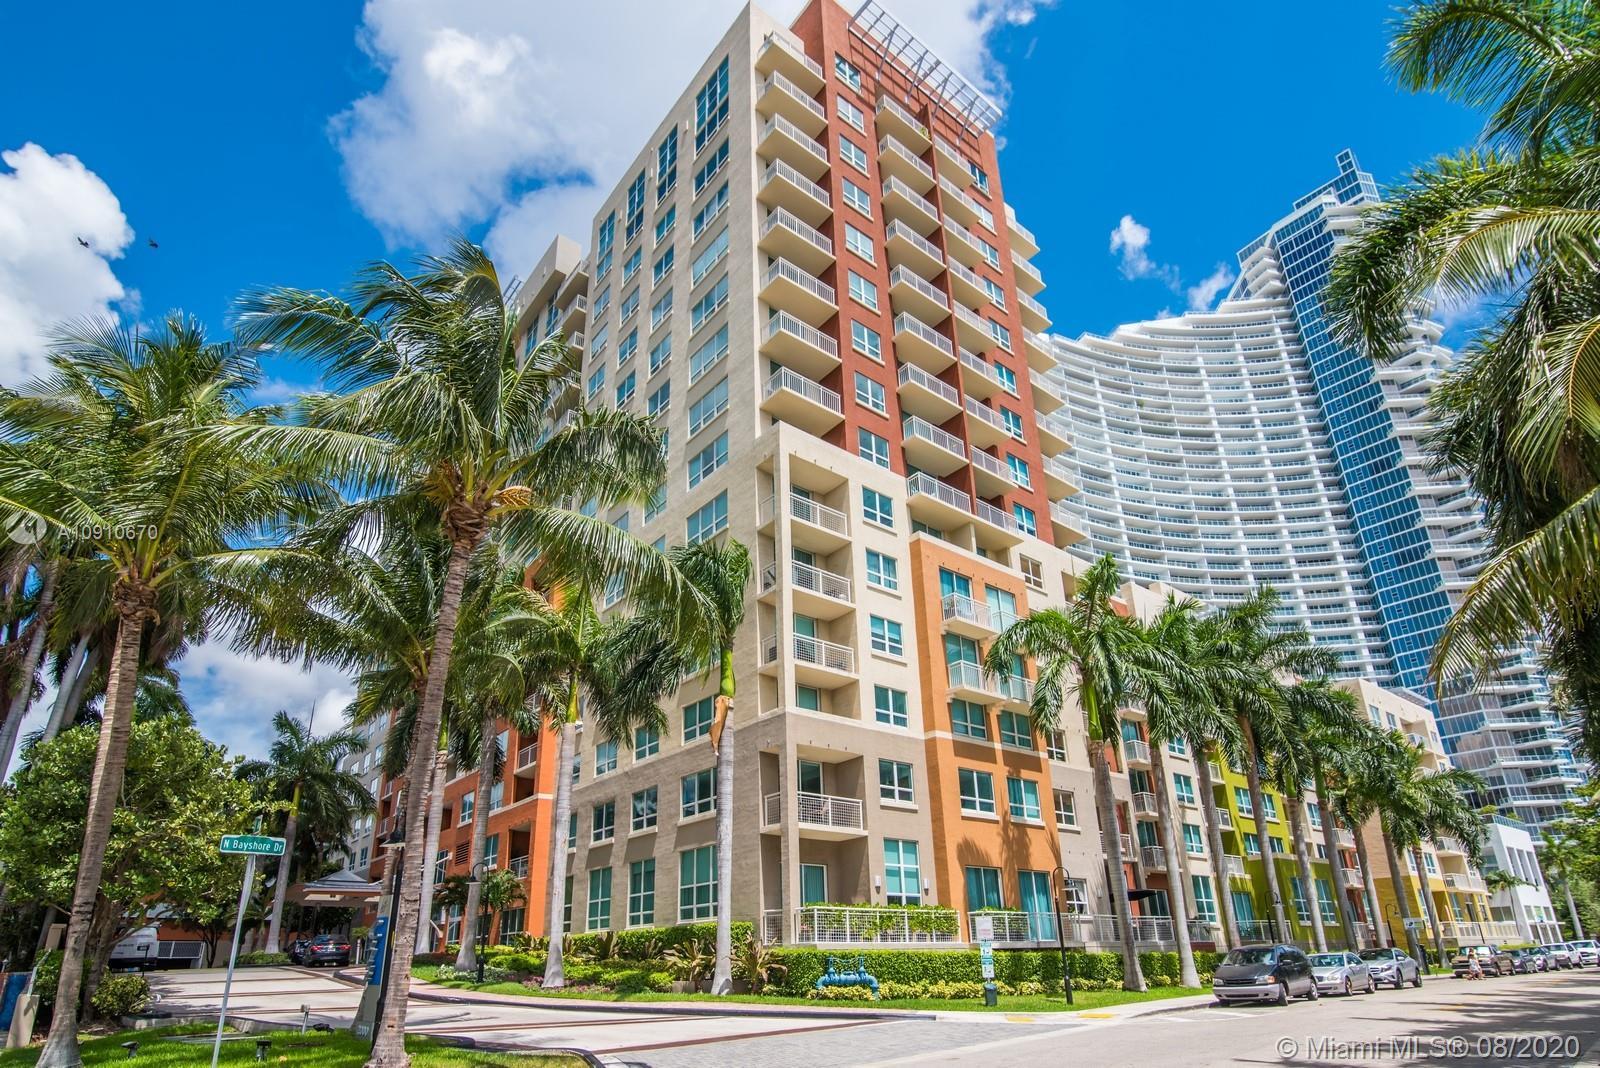 2000 N Bayshore Dr #401, Miami FL 33137